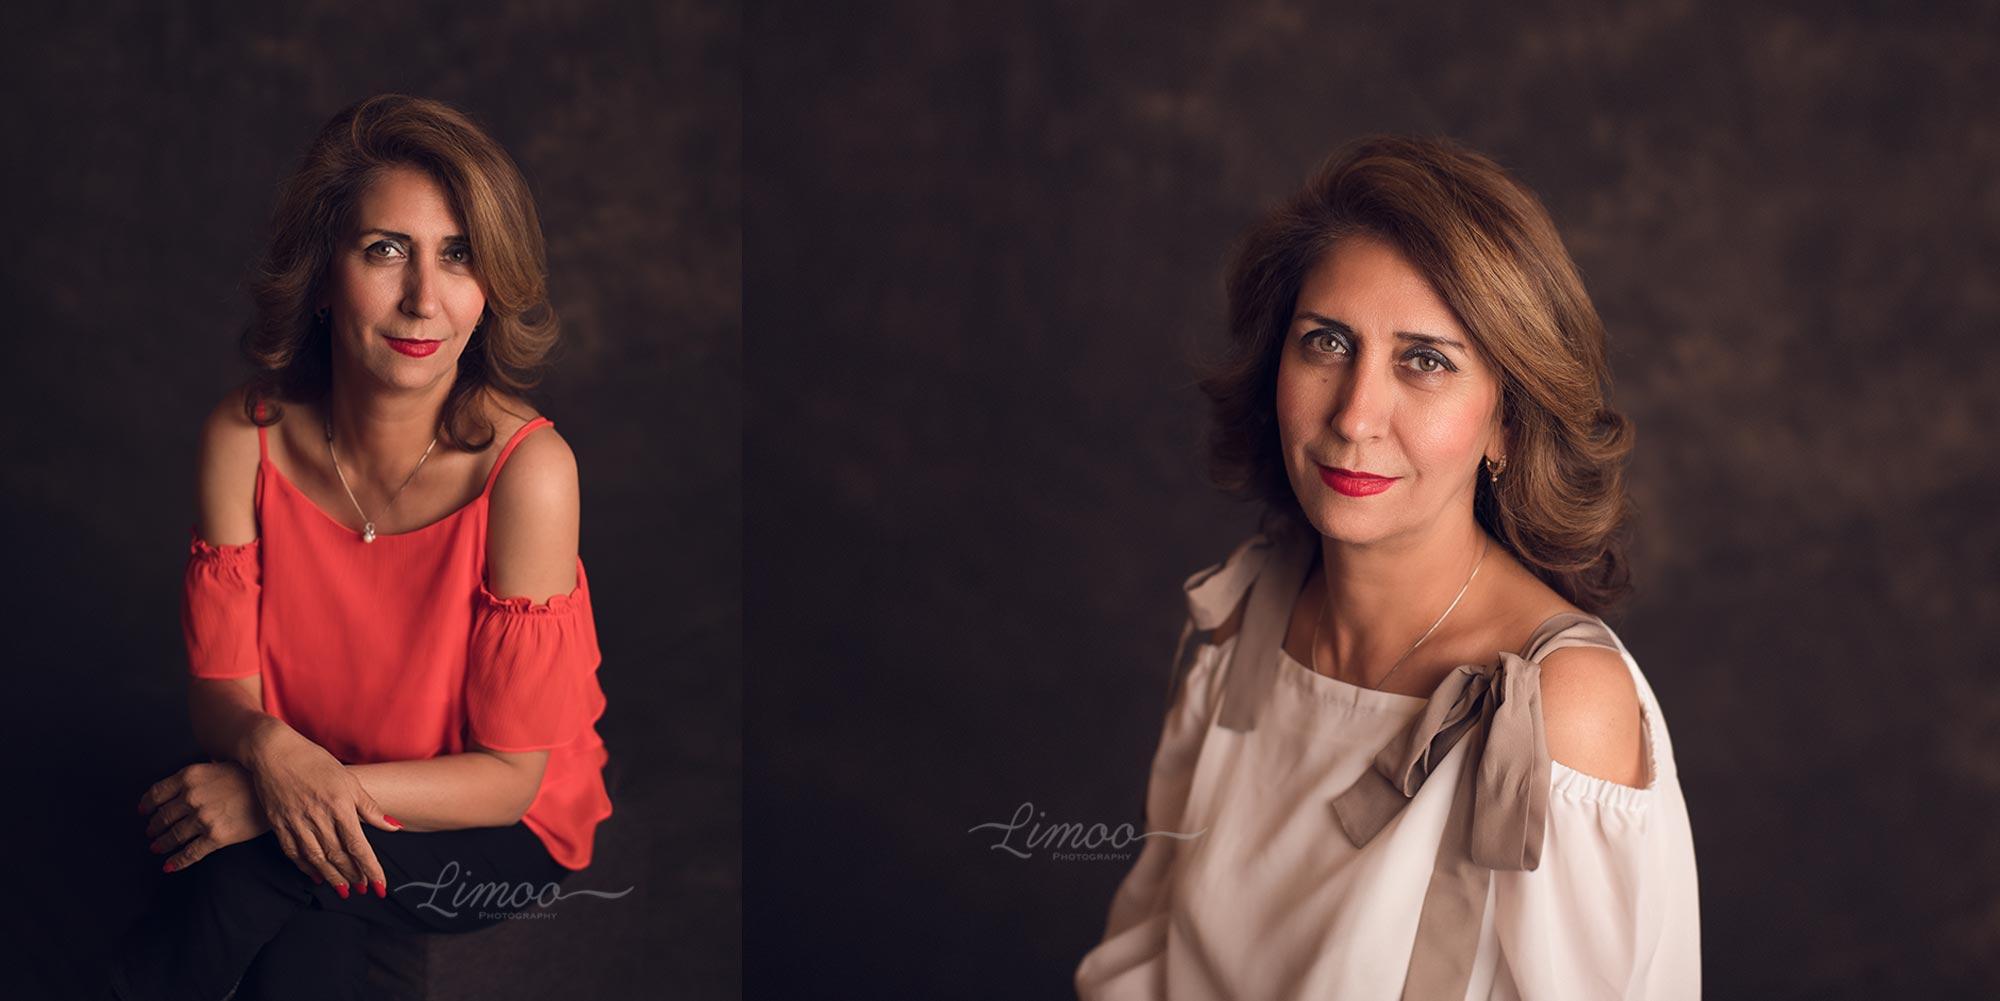 LimooPhotography-Portraitor-6